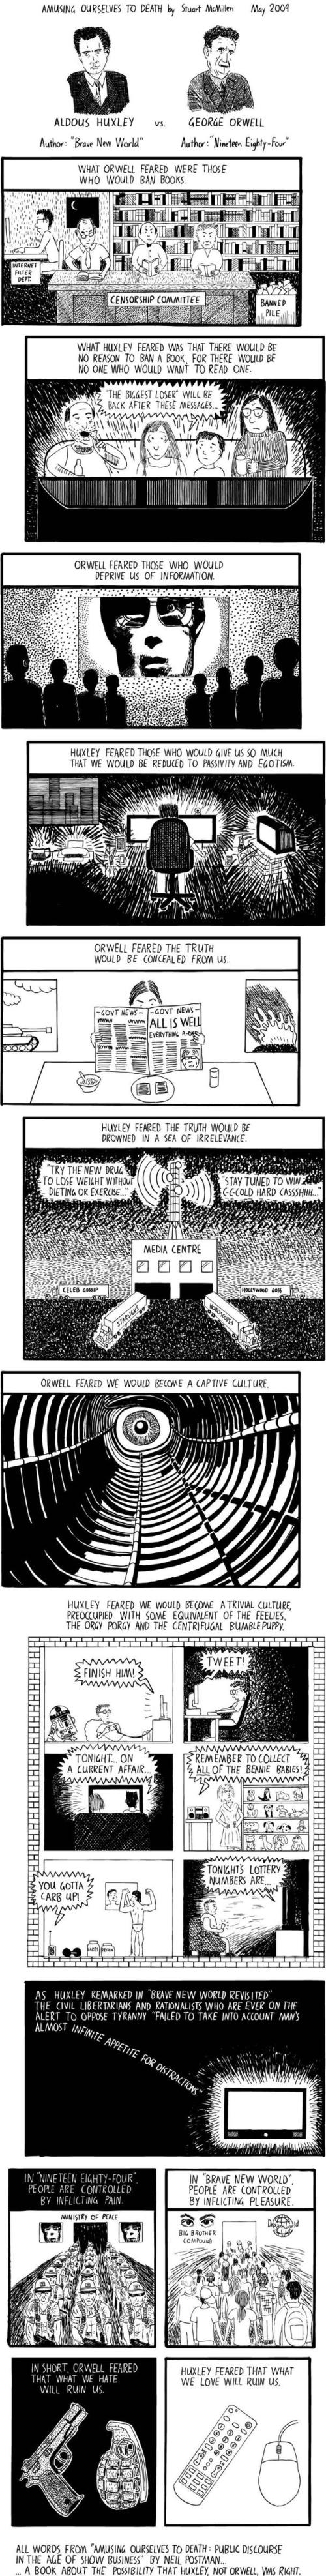 huxley-versus-orwell-comic[1]